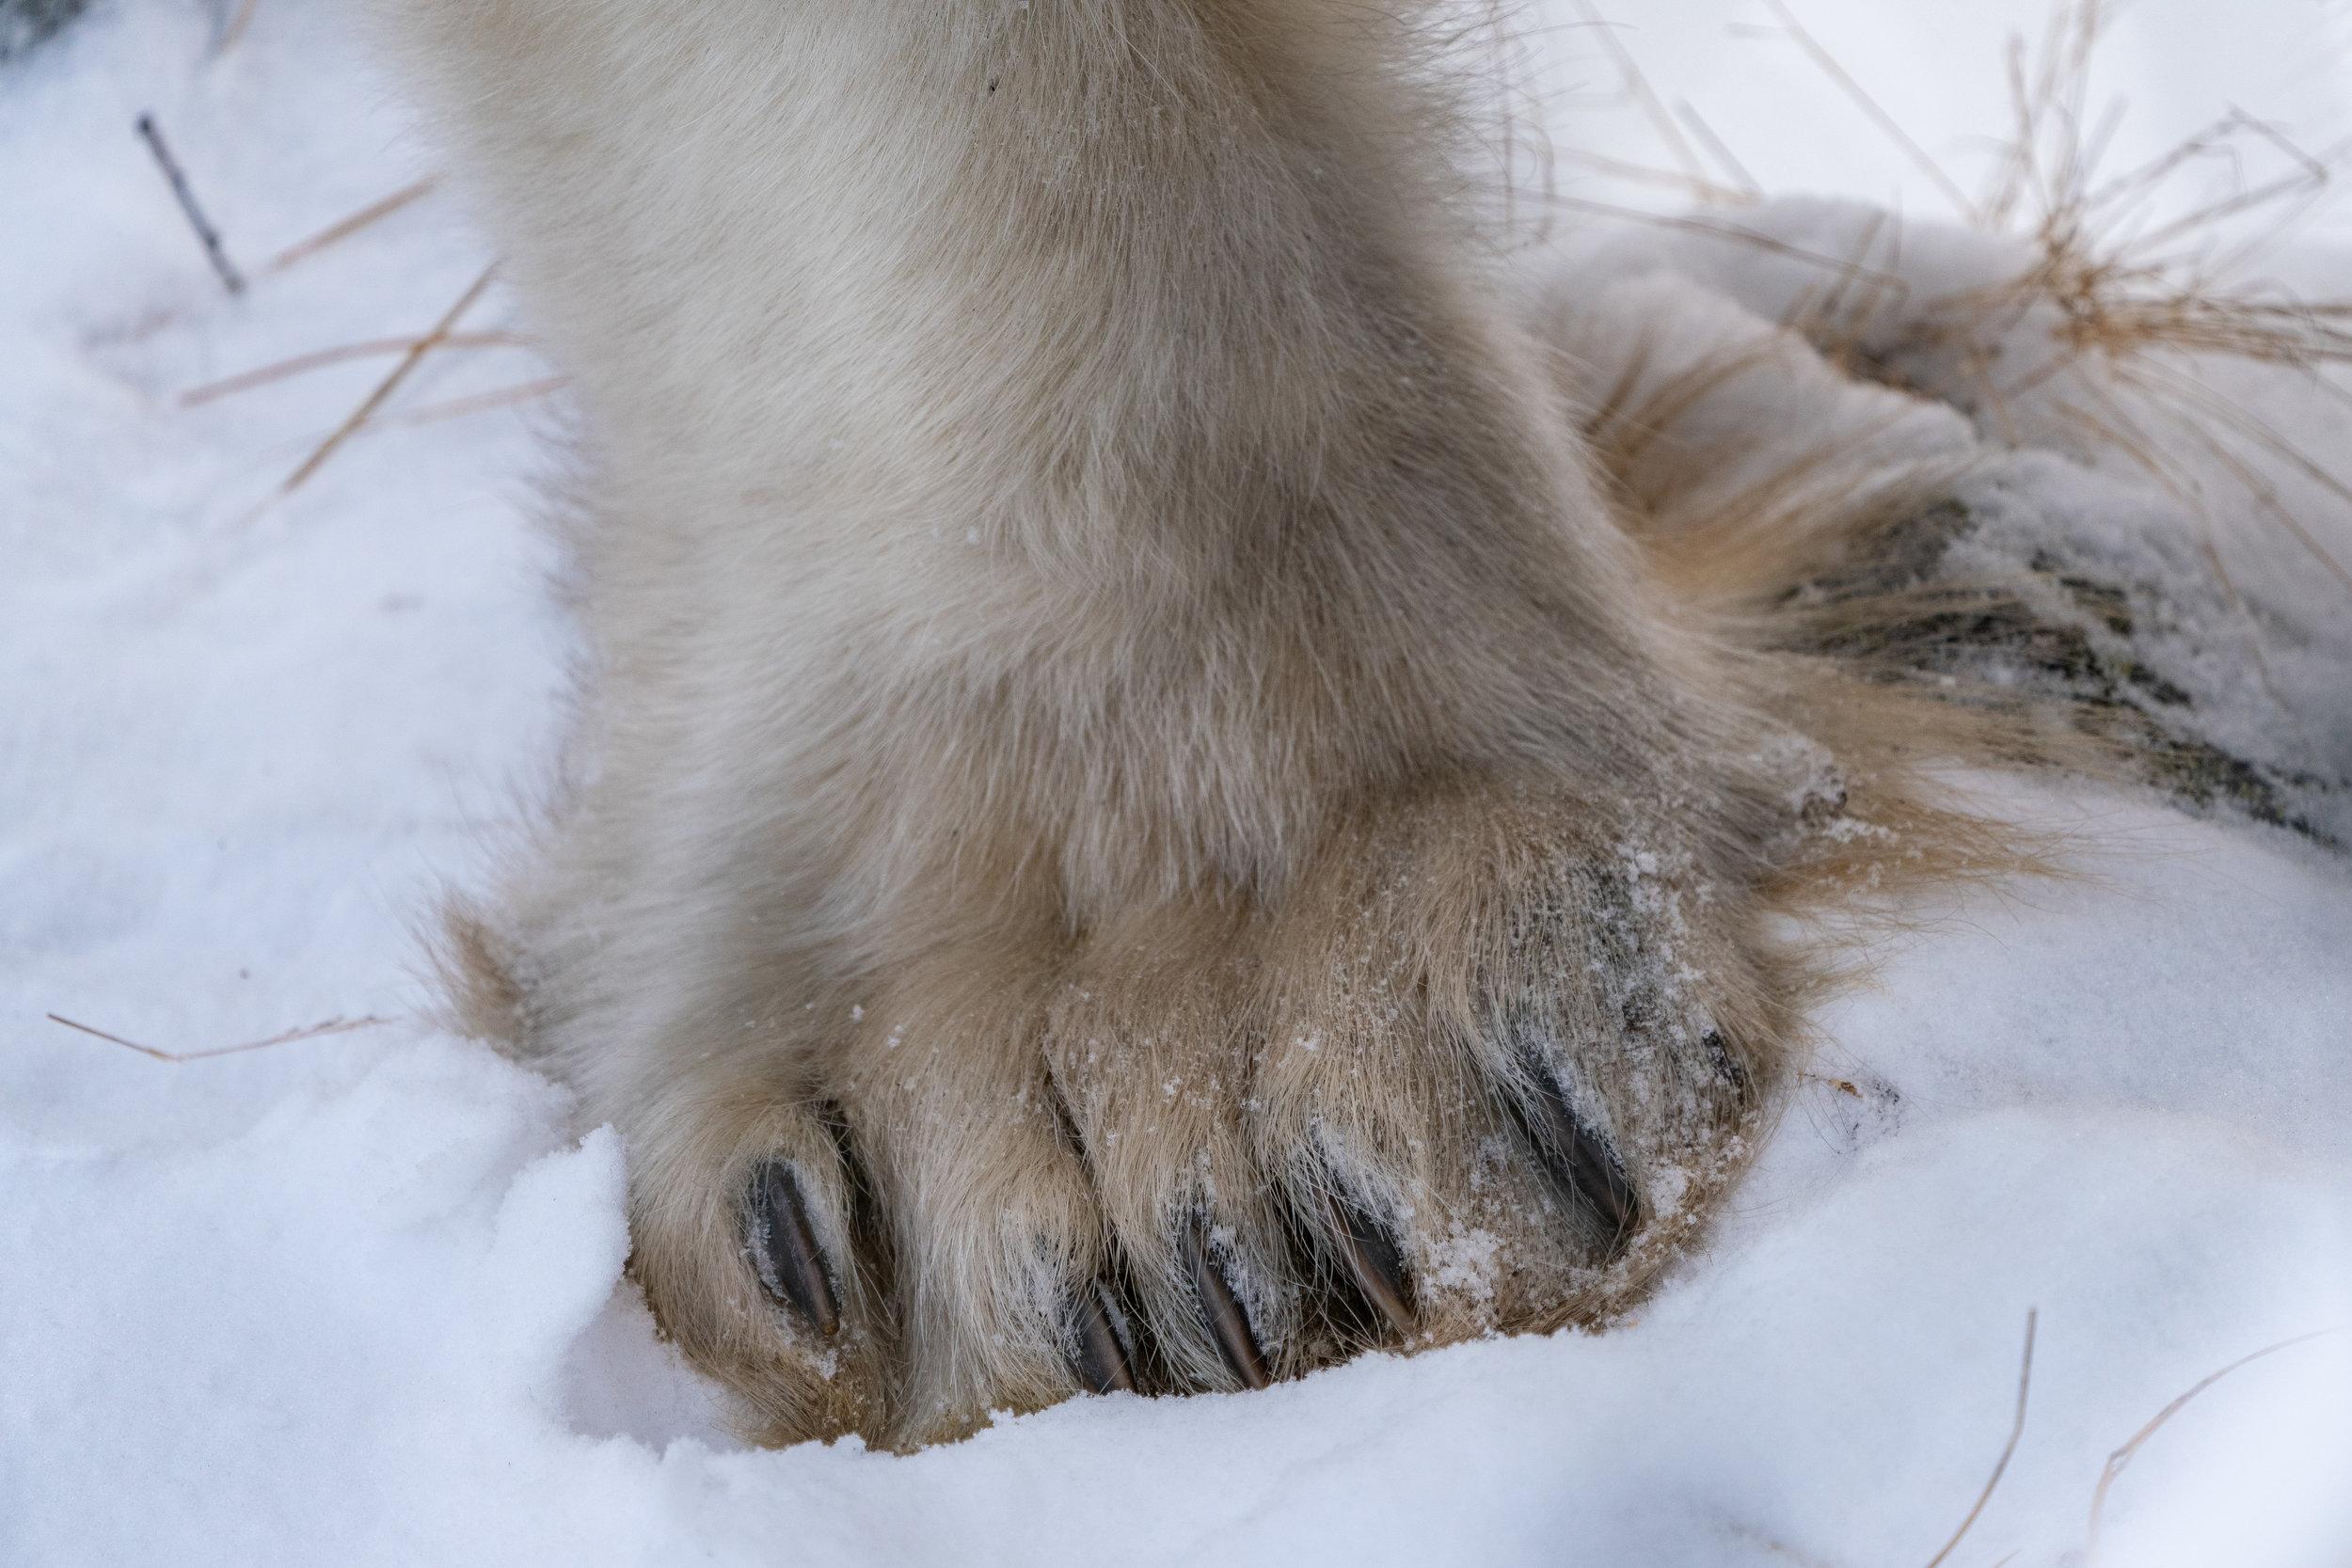 Pete: Old Feet